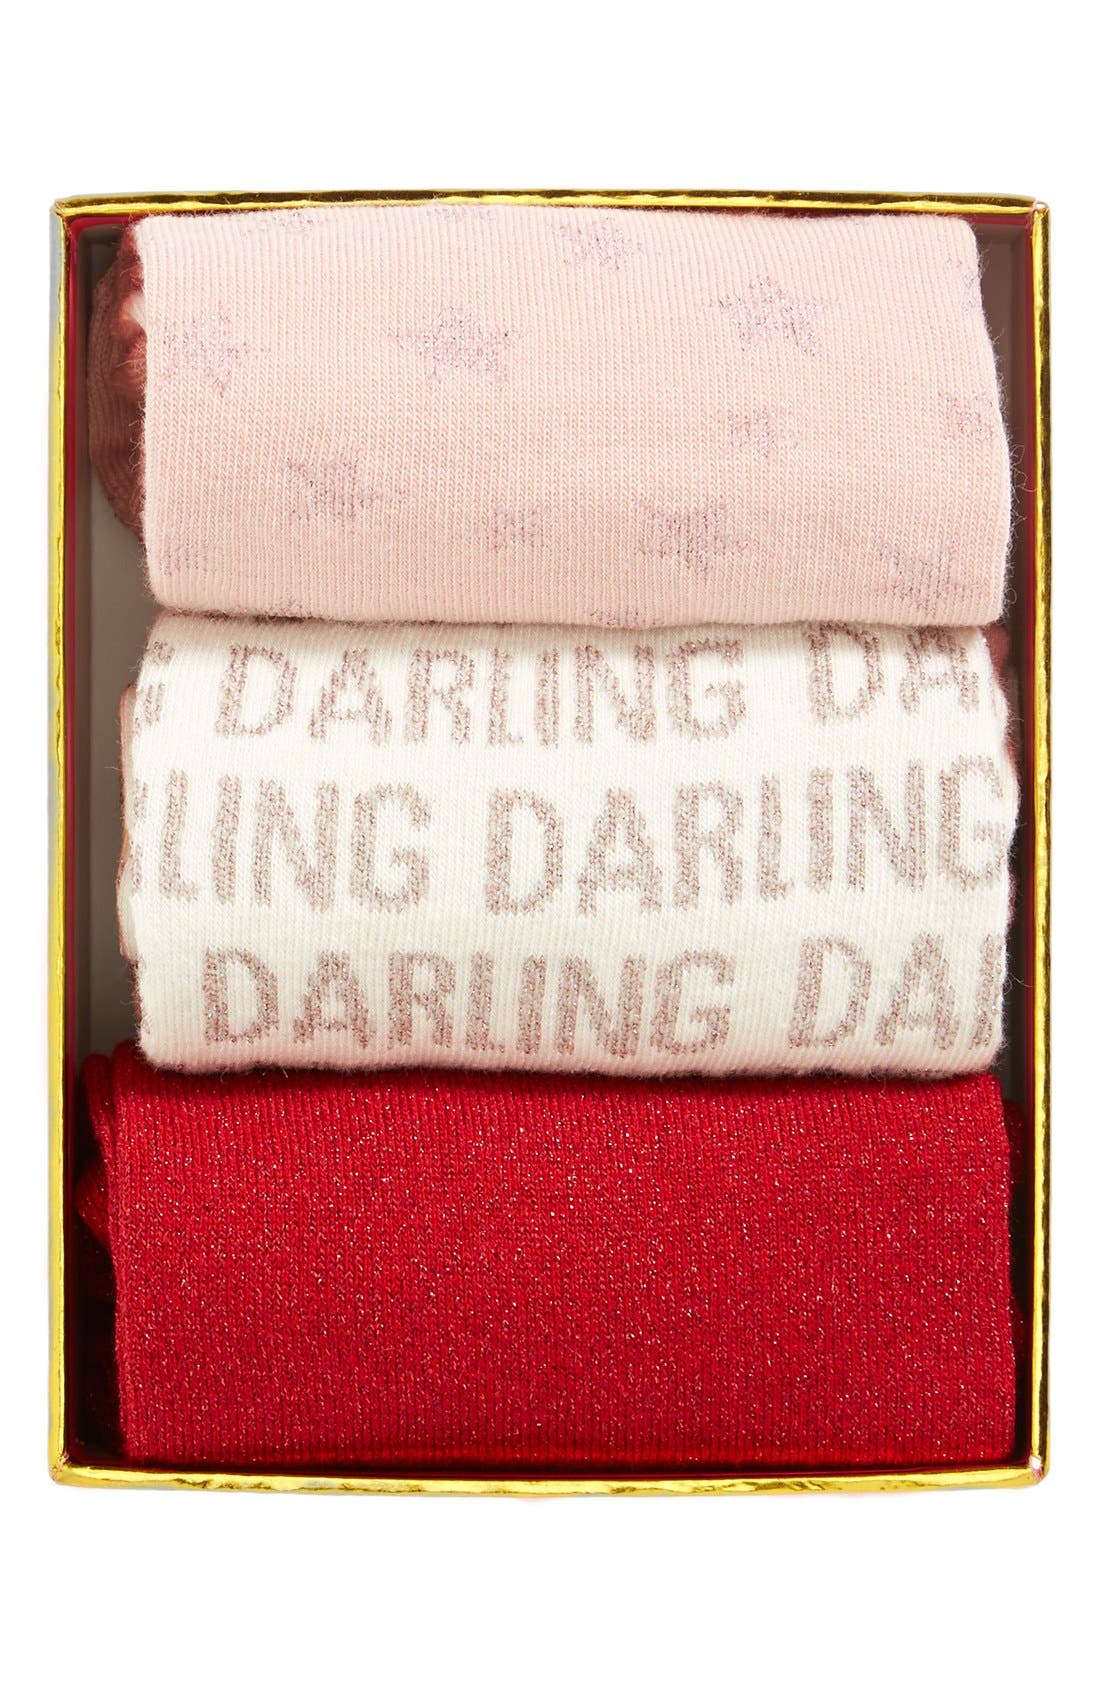 Main Image - kate spade new york 'day' boxed socks (3-Pack)